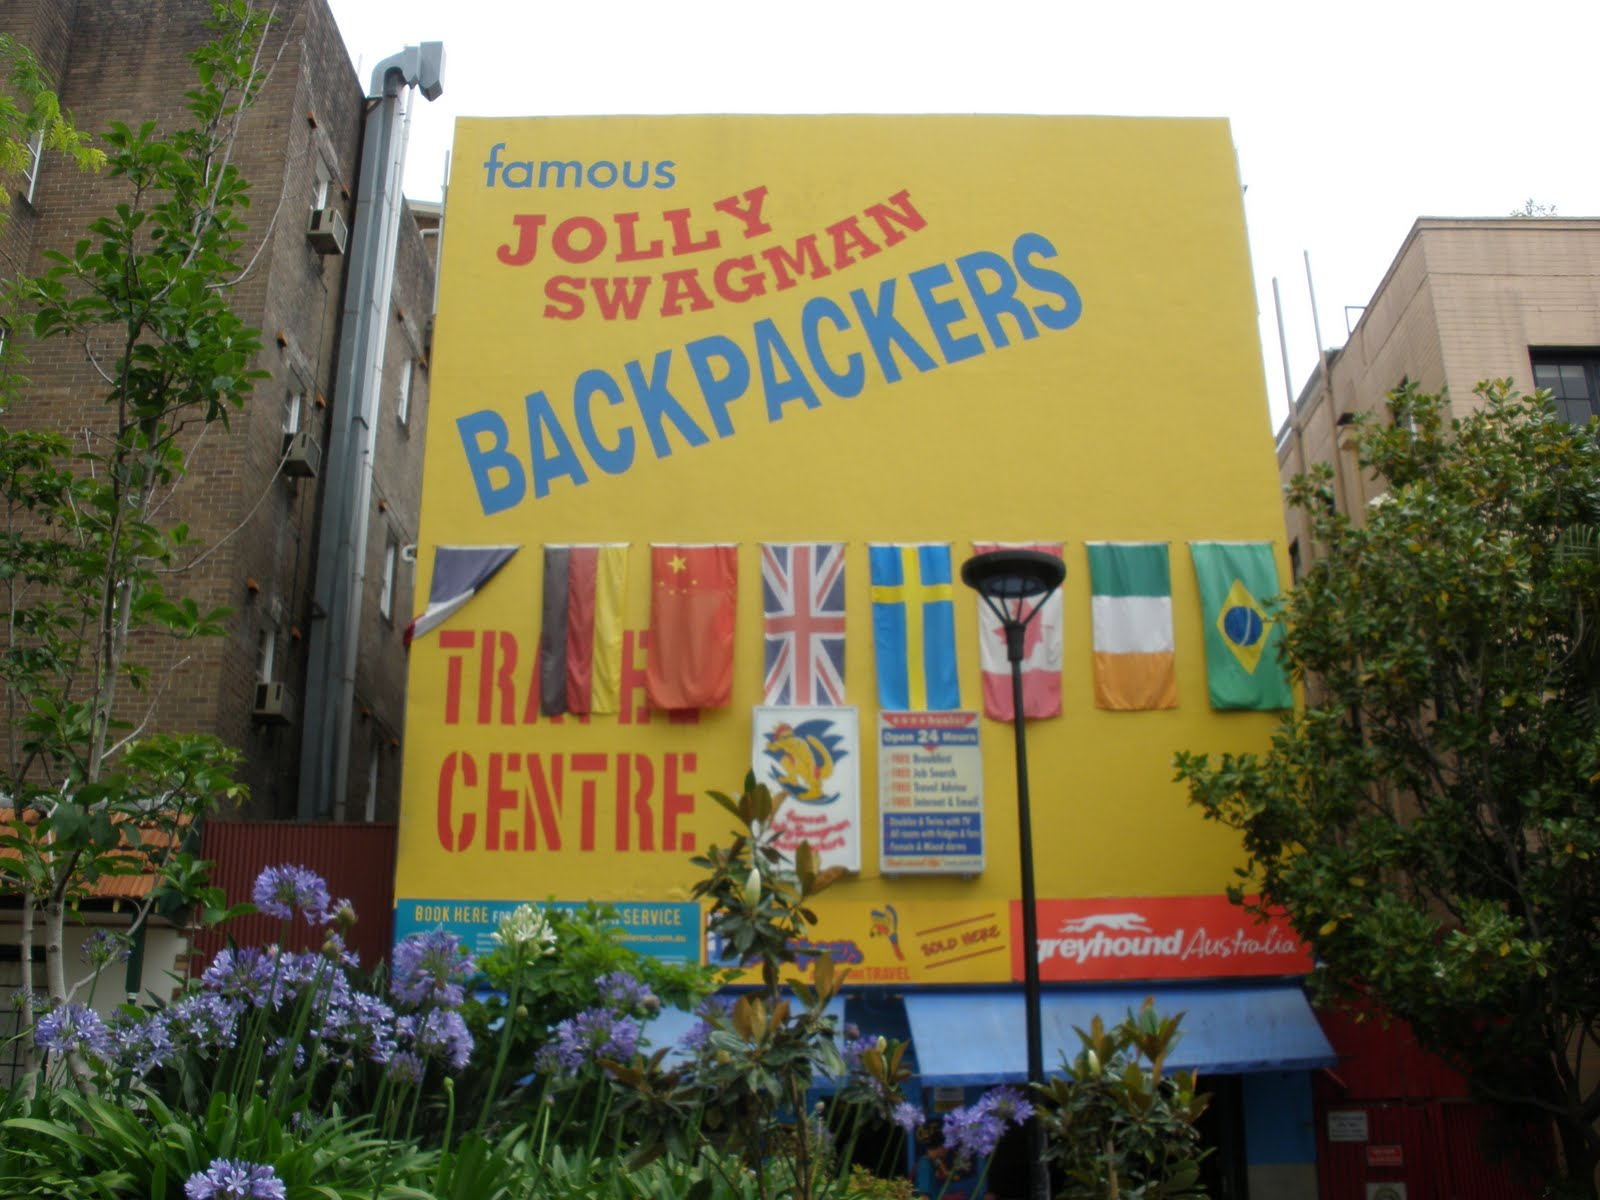 Jolly Swagman Backpackers Sydney